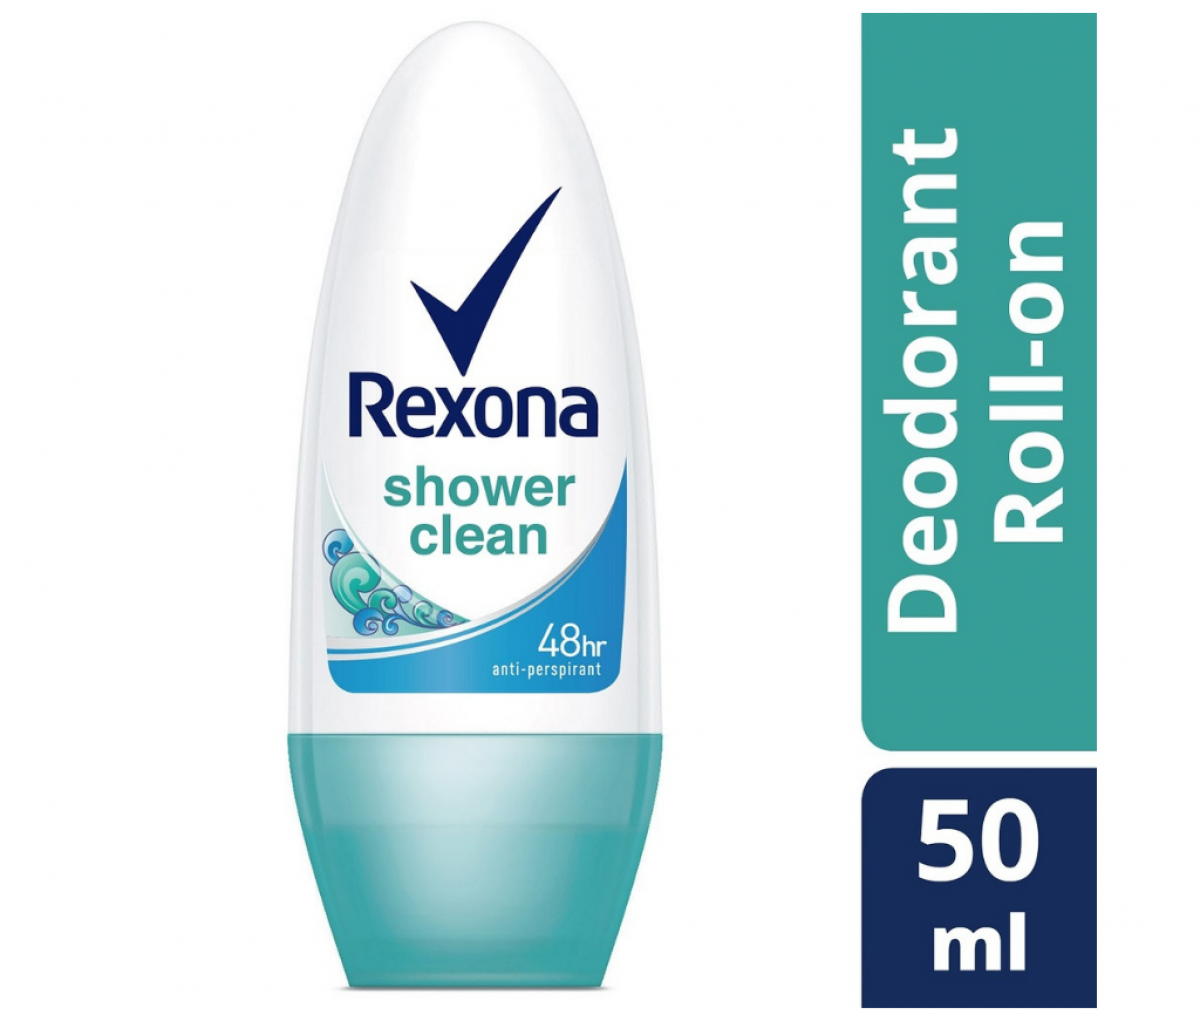 Rexona 50ml Shower Clean